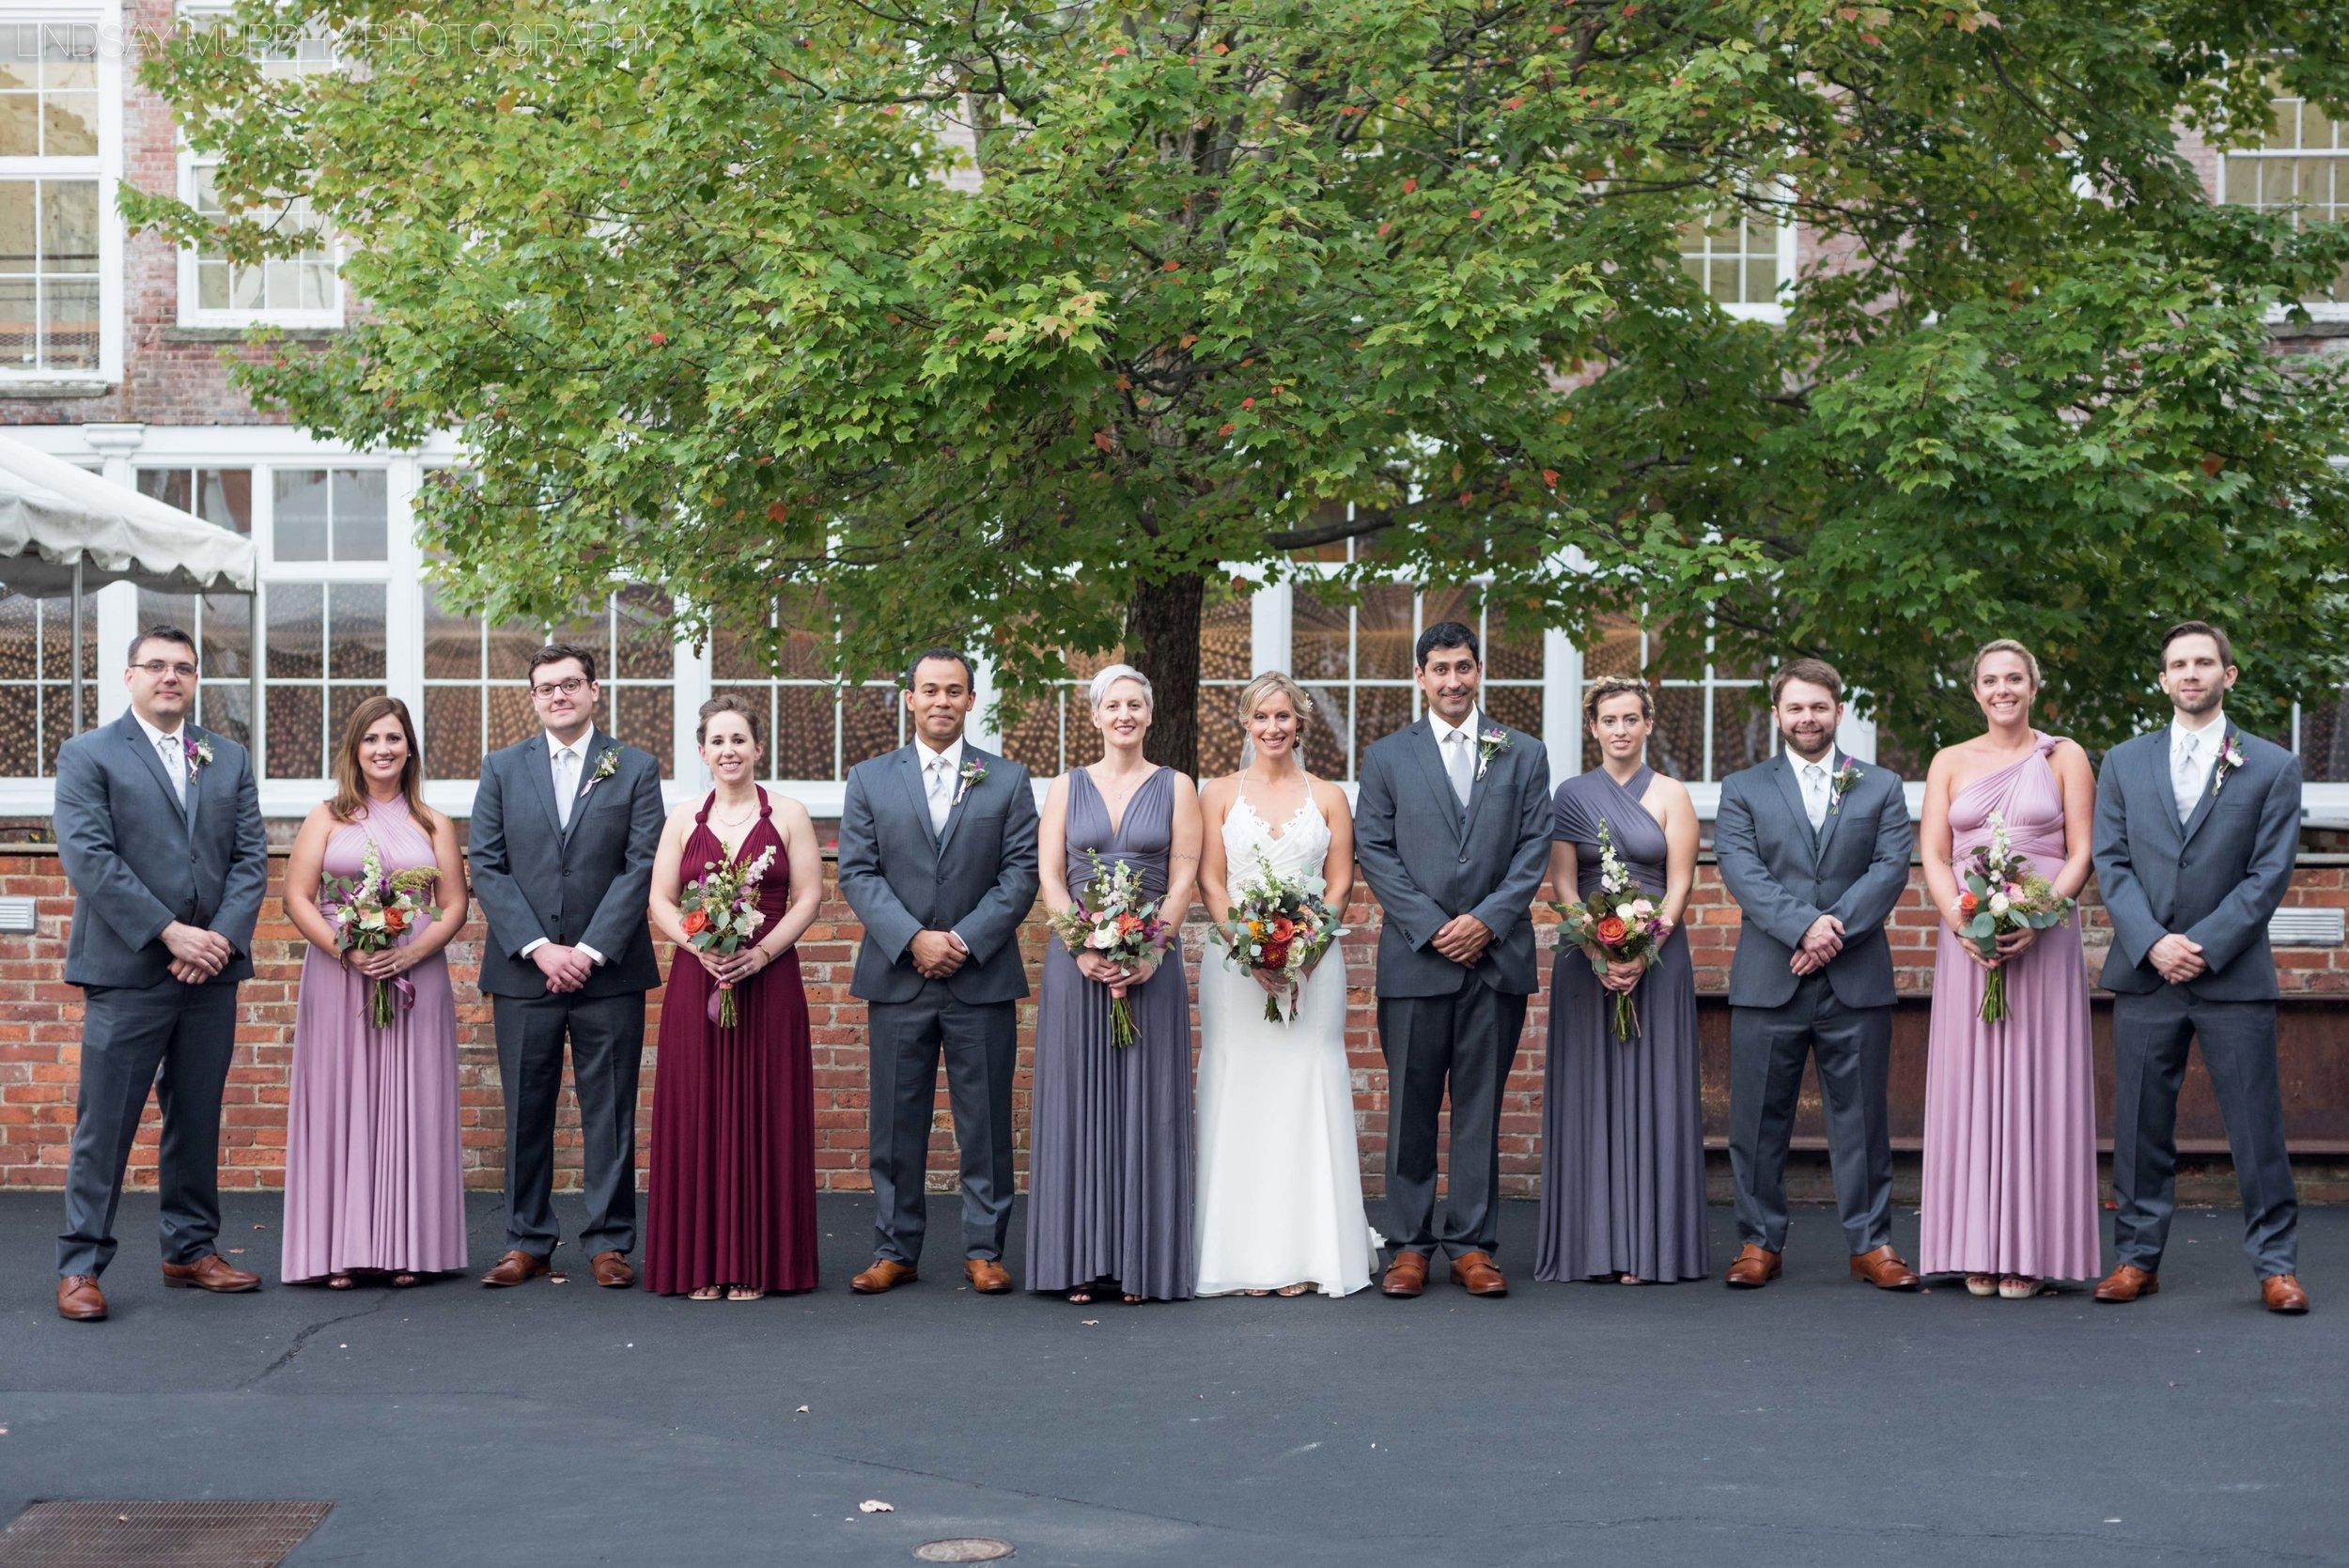 New_England_wedding-19.jpg